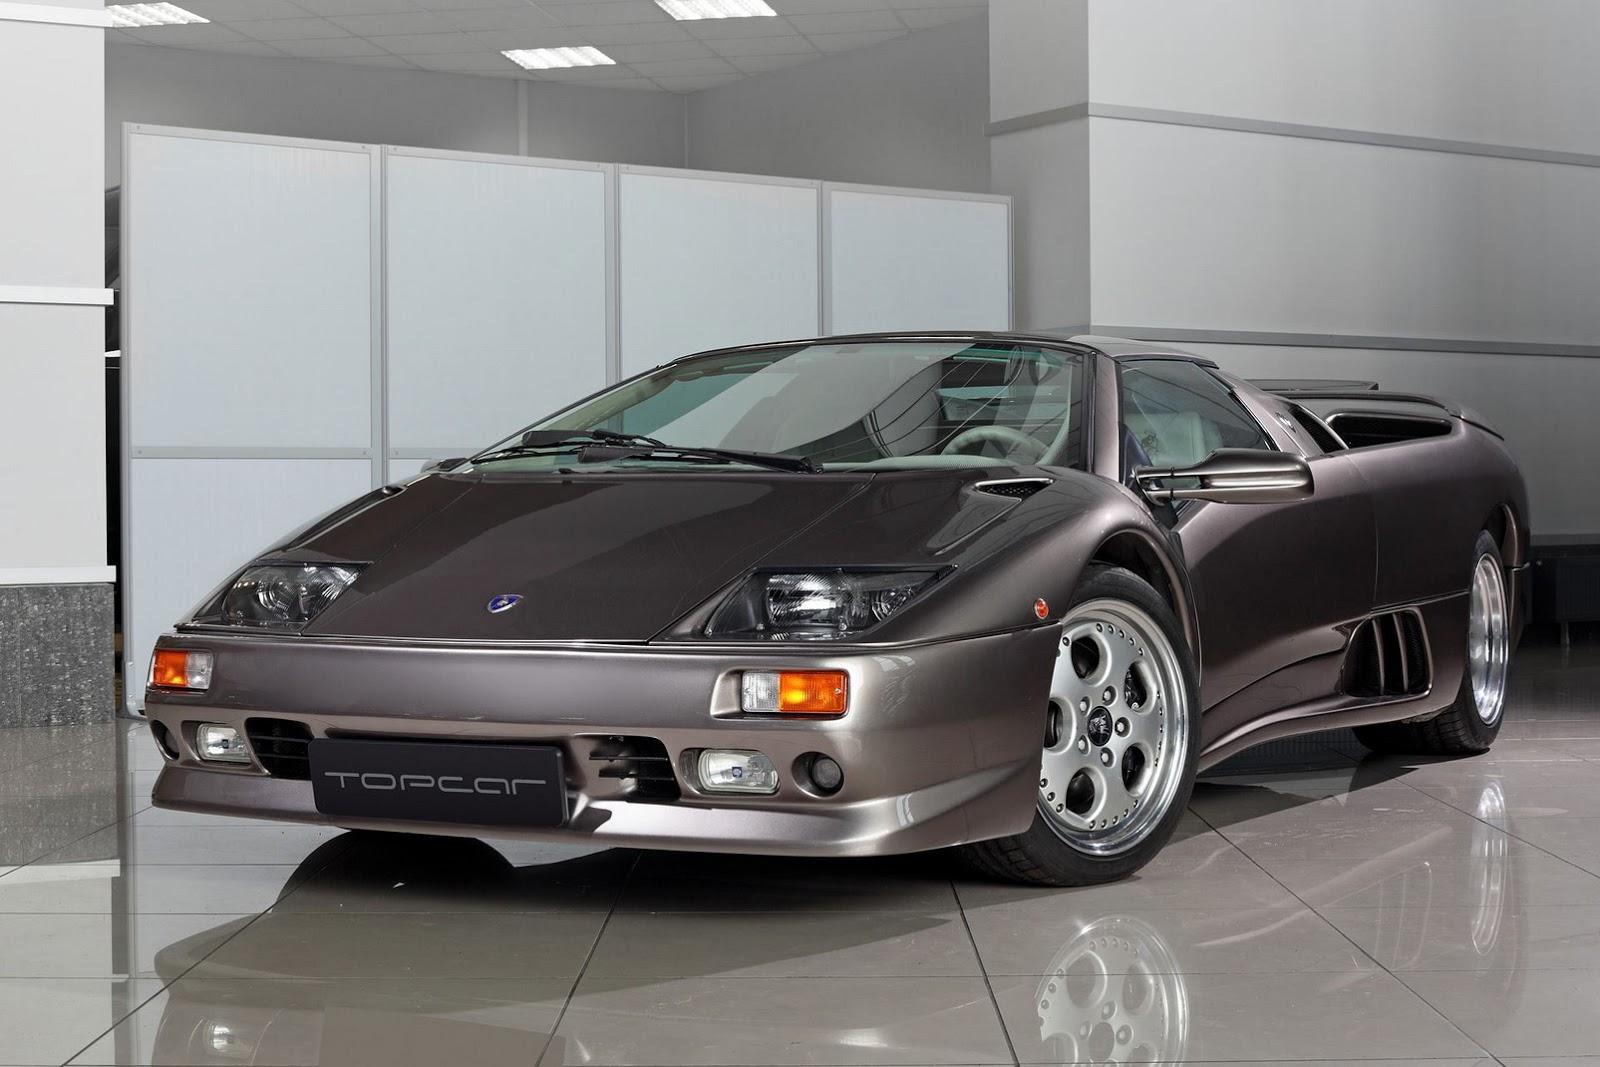 Lamborghini Diablo VT Roadster by TopCar